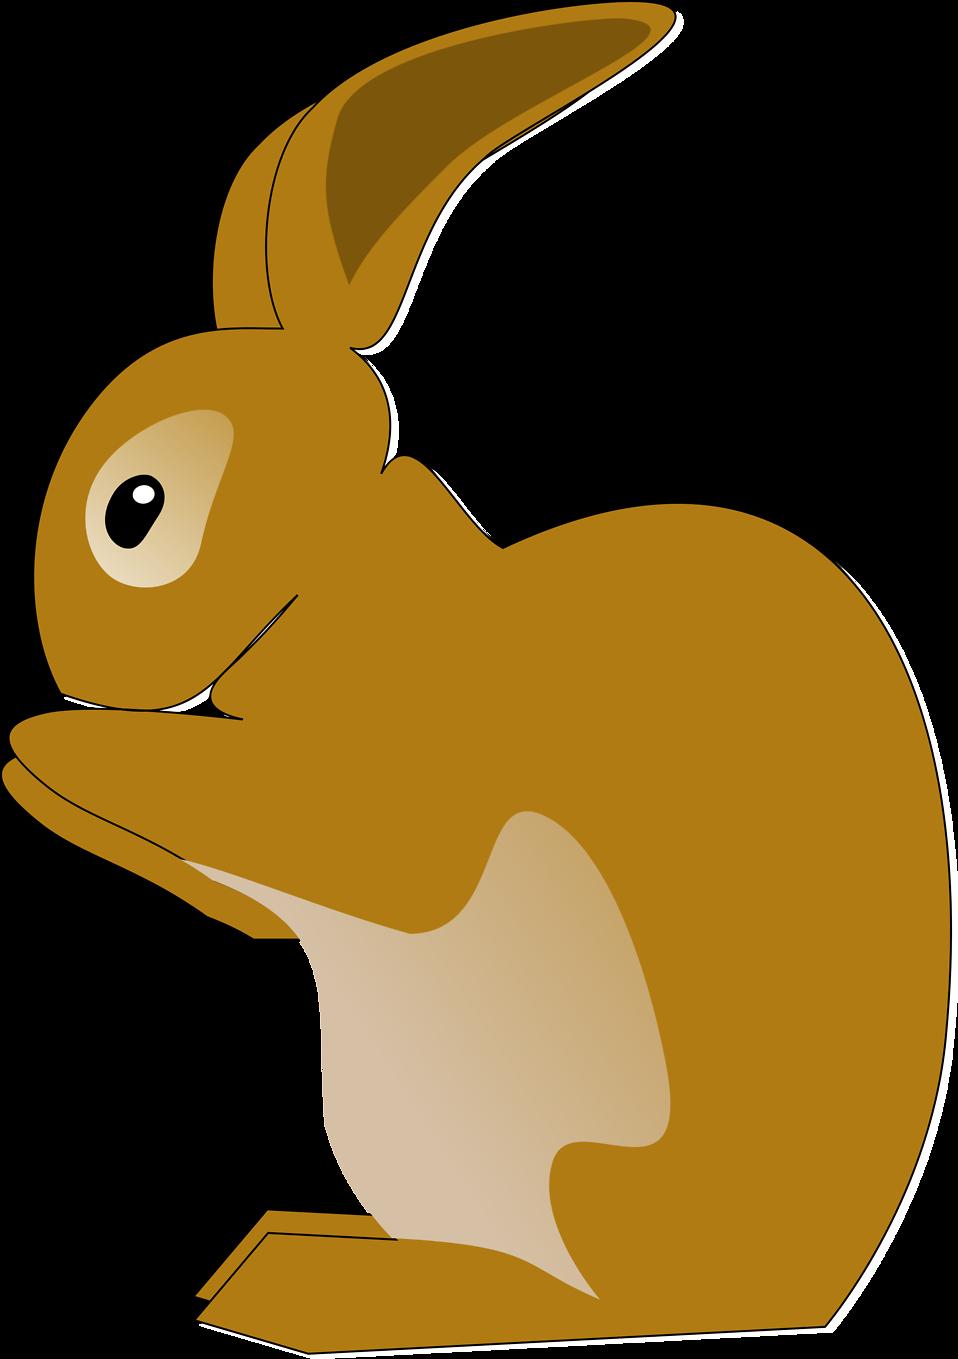 Clipart bunny transparent background. Rabbit free stock photo